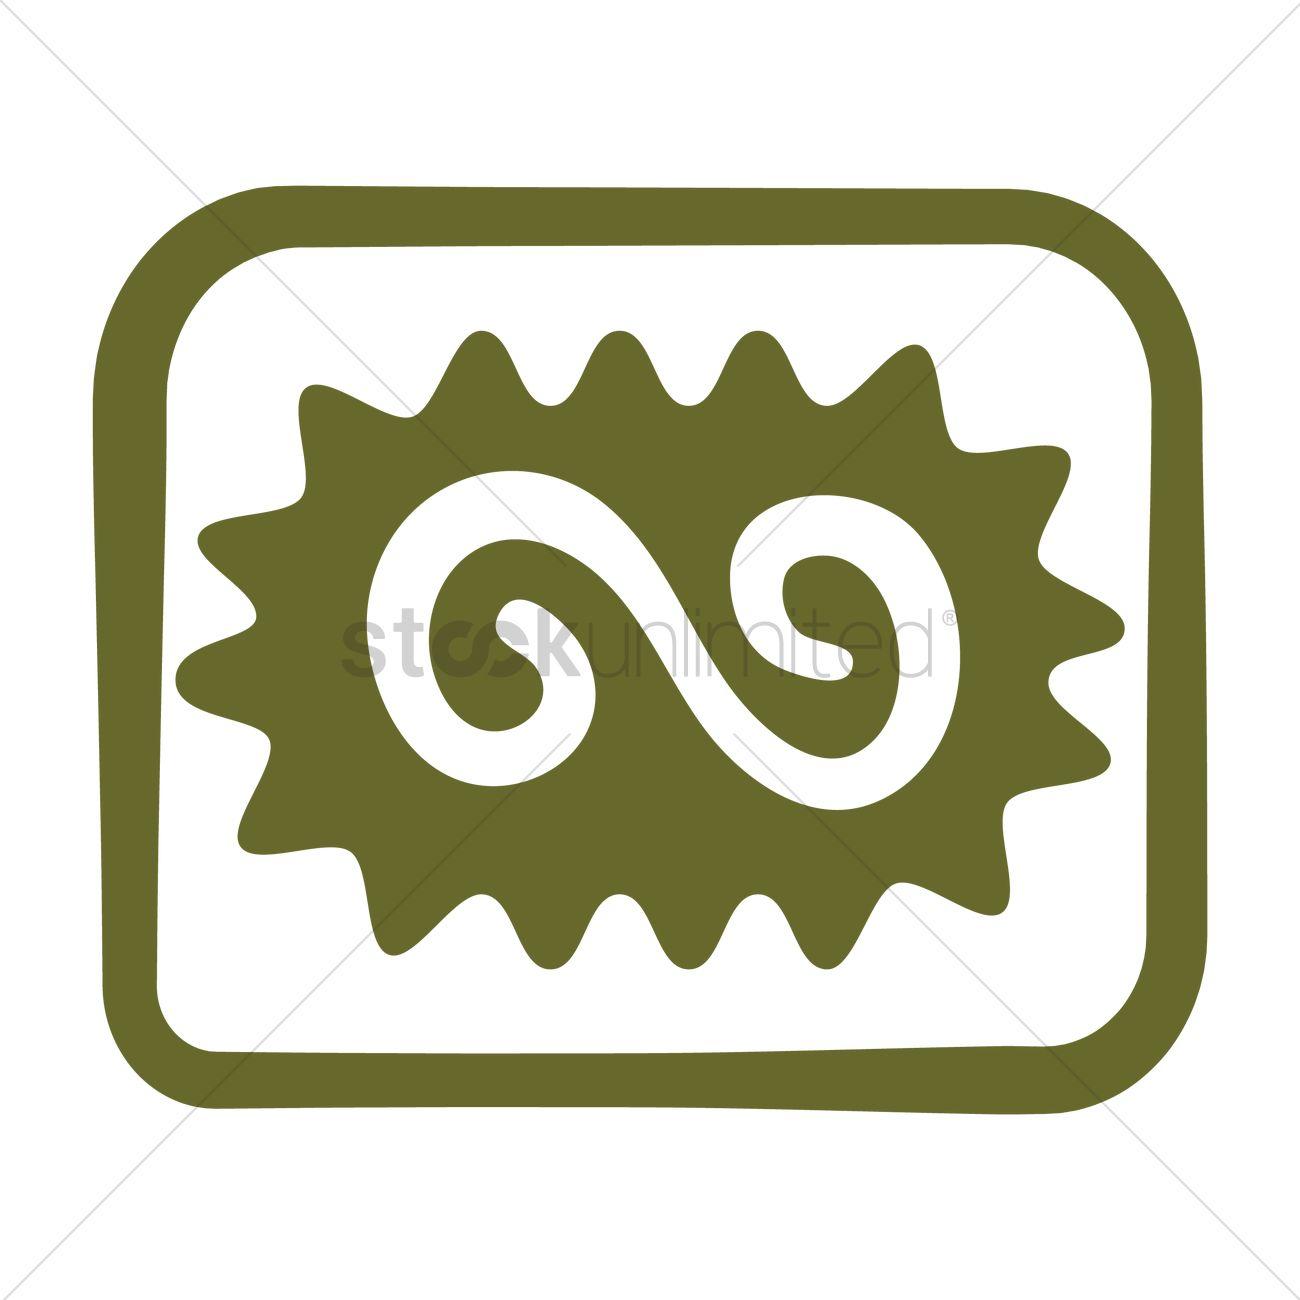 Aztec symbol design vector image 2014264 stockunlimited aztec symbol design vector graphic biocorpaavc